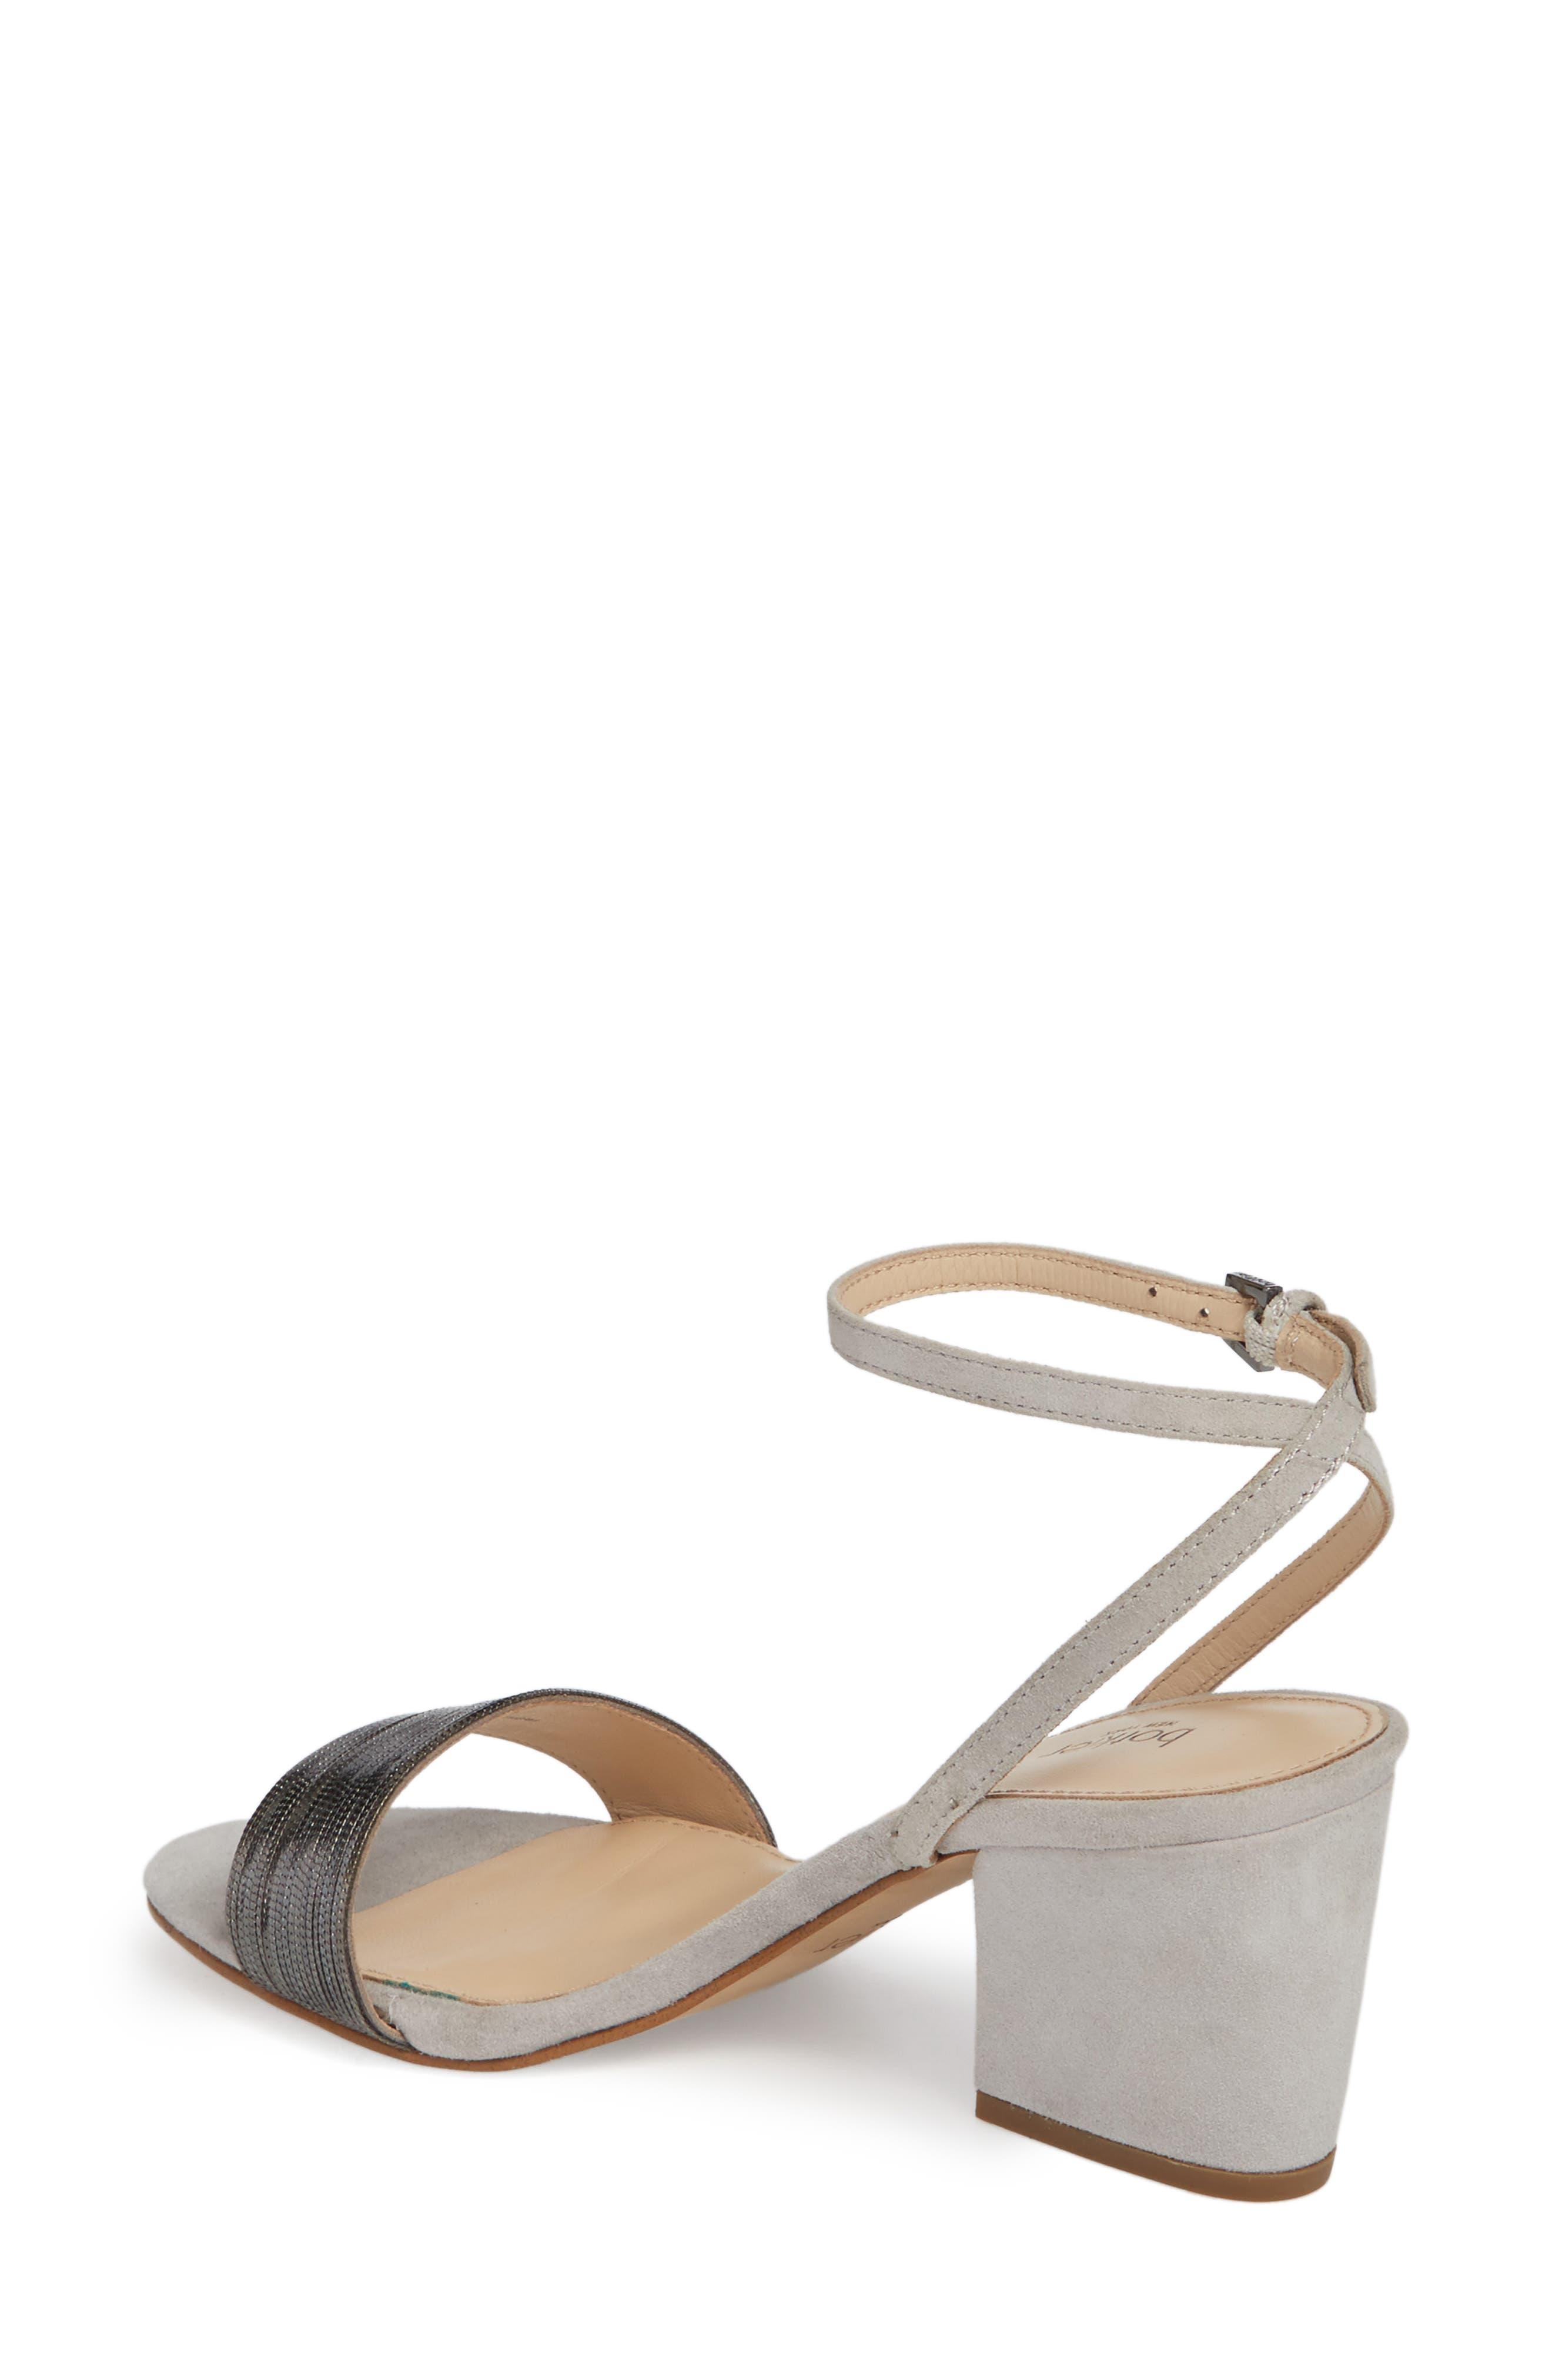 Persi Chain Wraparound Sandal,                             Alternate thumbnail 2, color,                             040